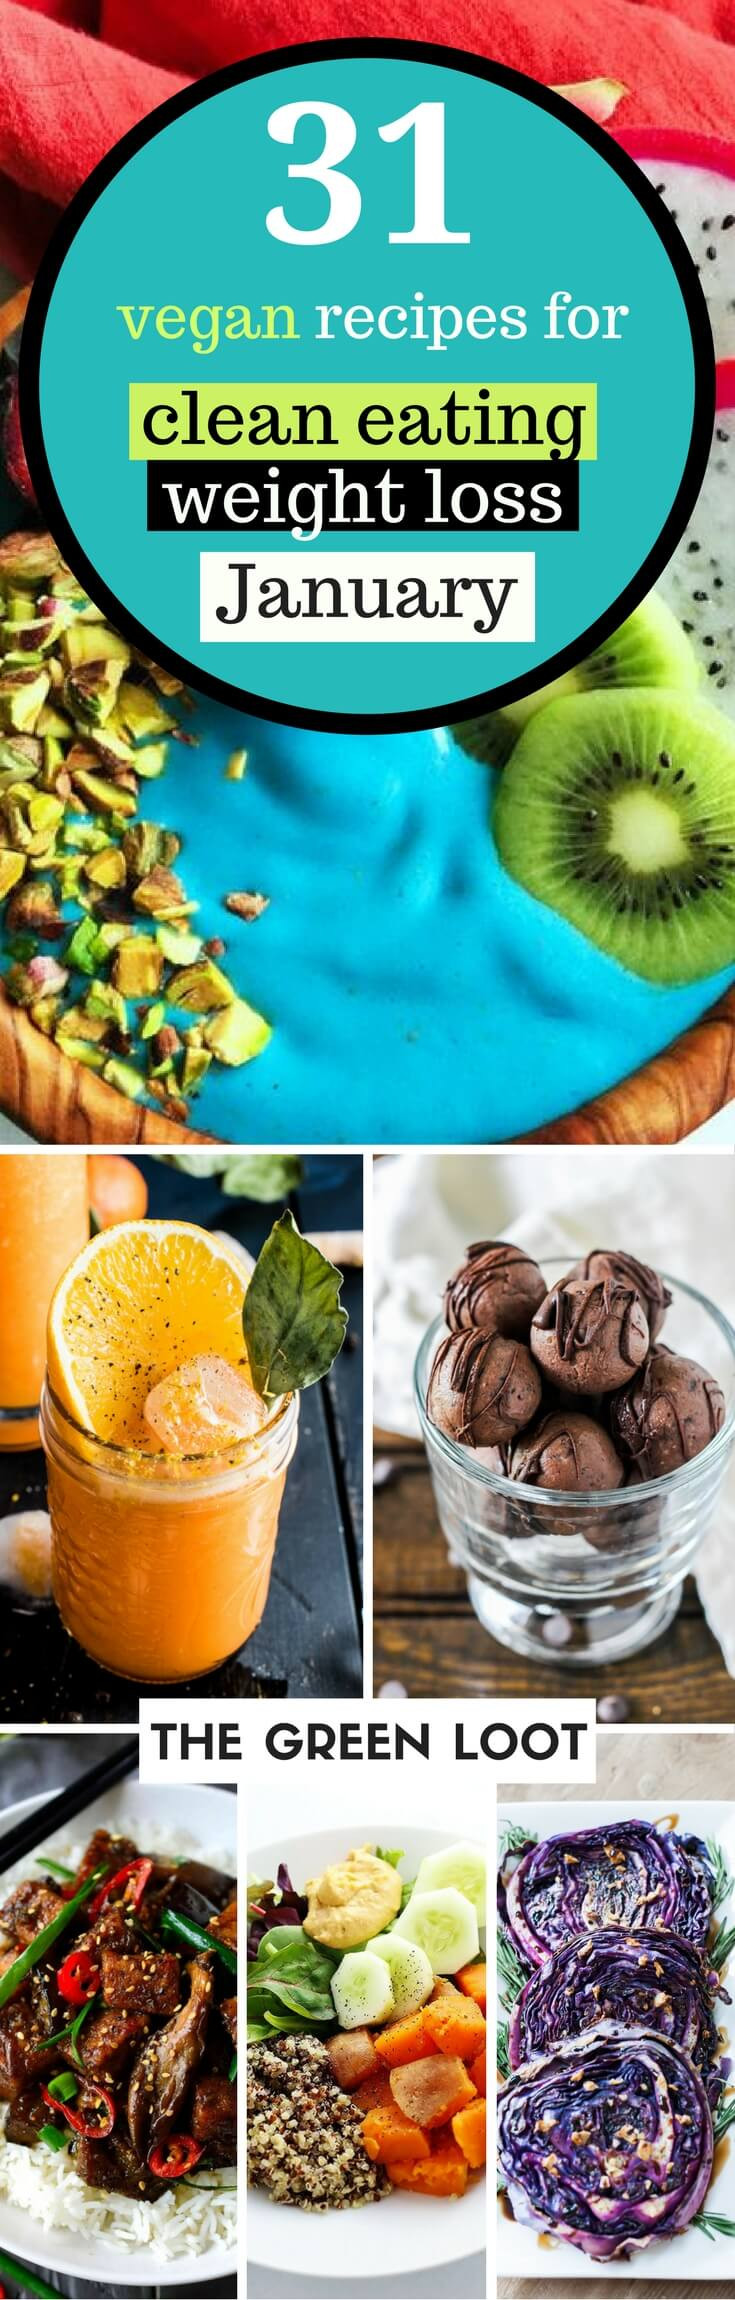 Healthy Vegan Recipes For Weight Loss  31 Vegan Clean Eating Weight Loss Recipes for January